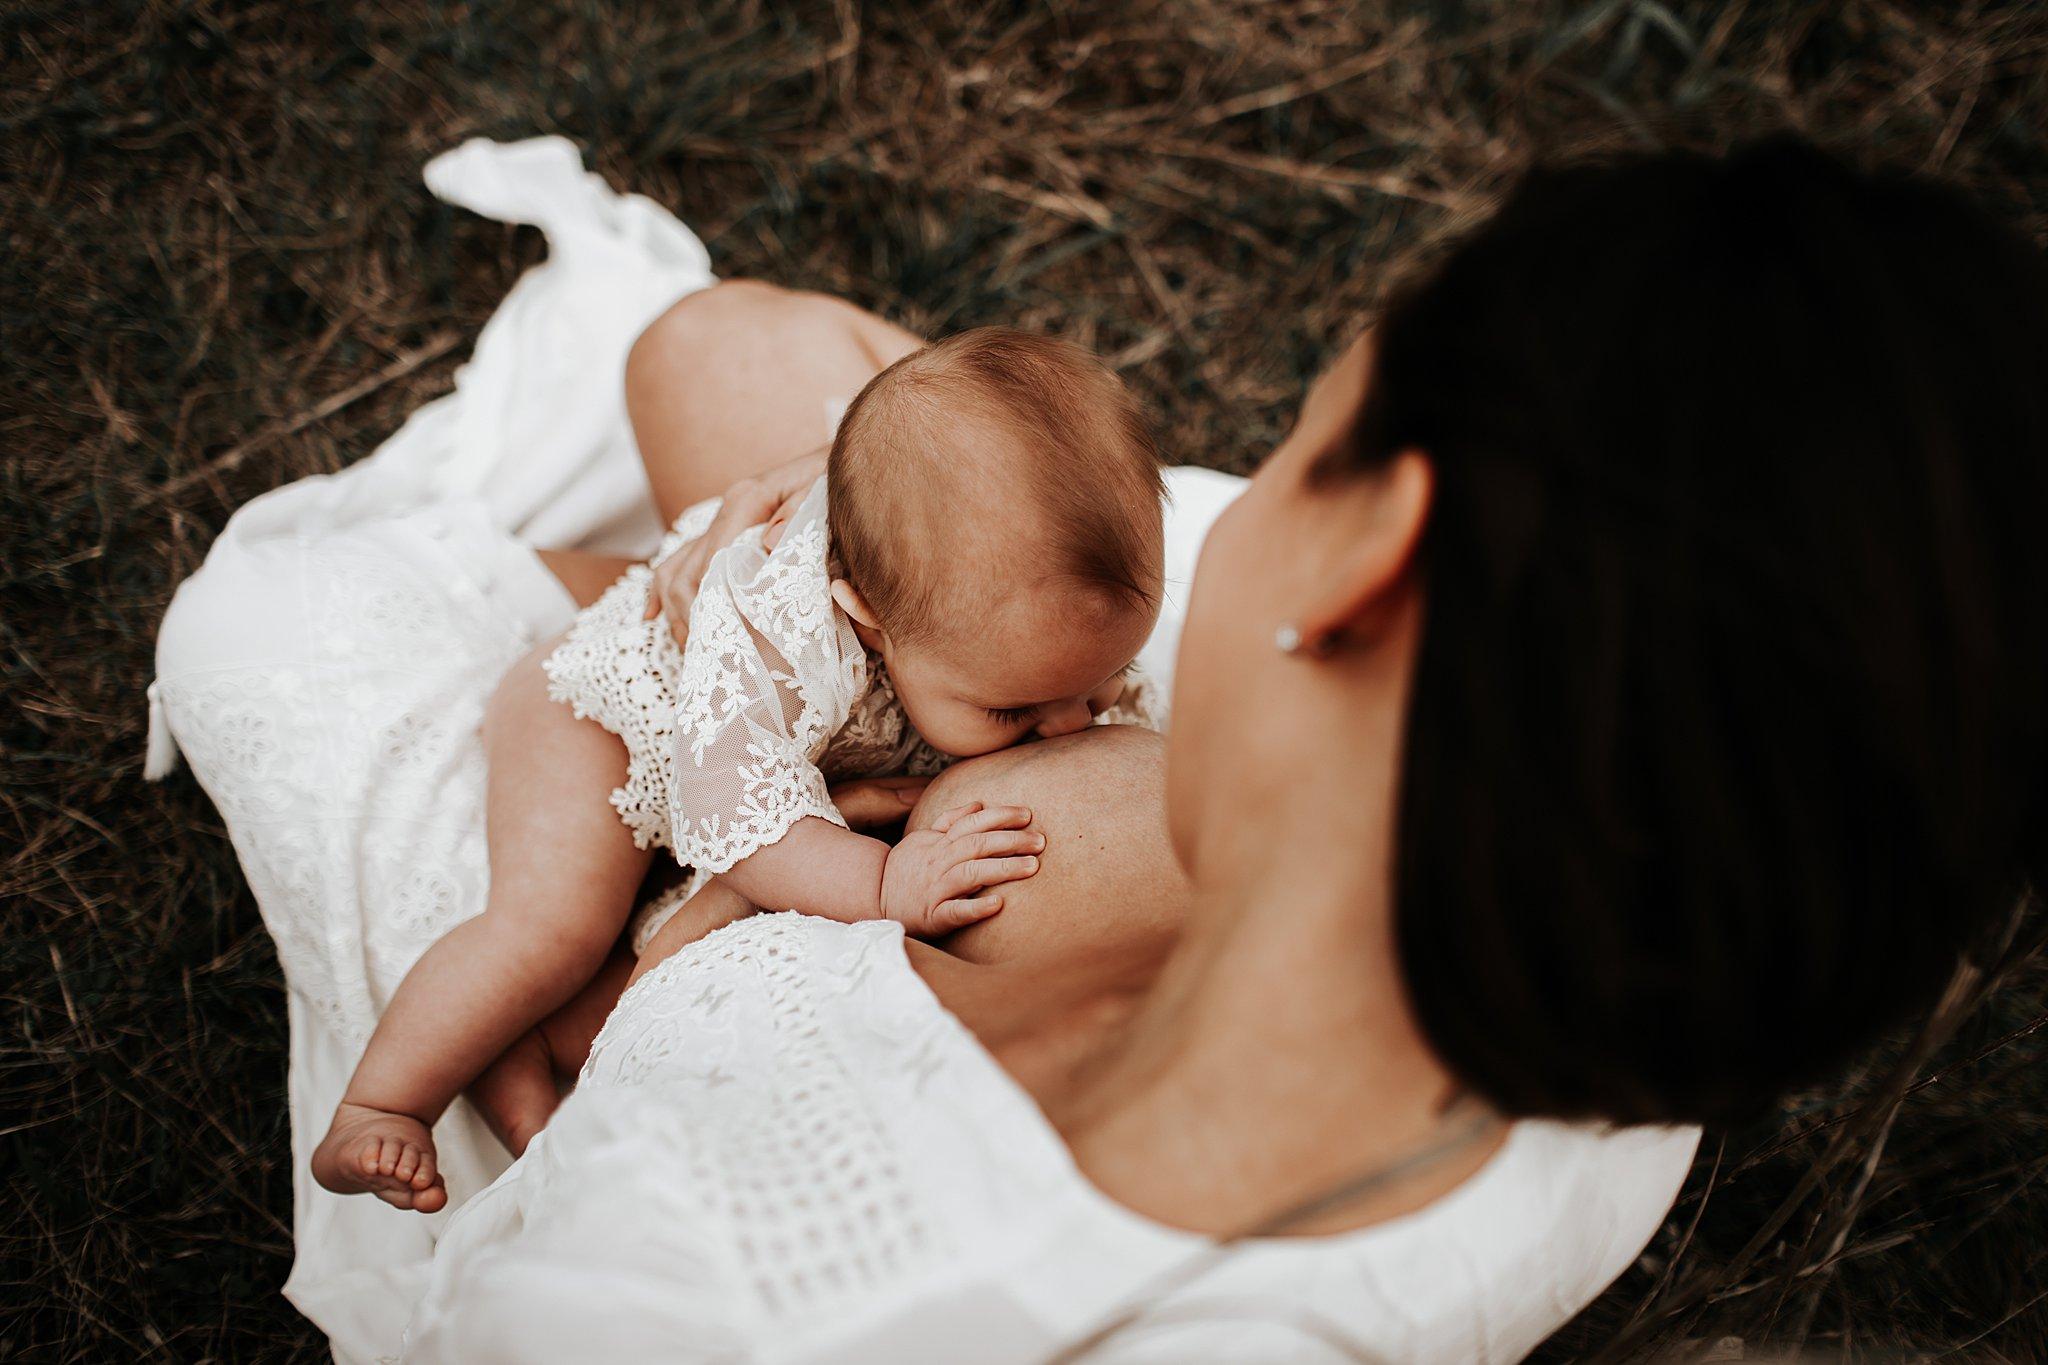 Shelby-San-Antonio-Family-Photographer-21_WEB.jpg